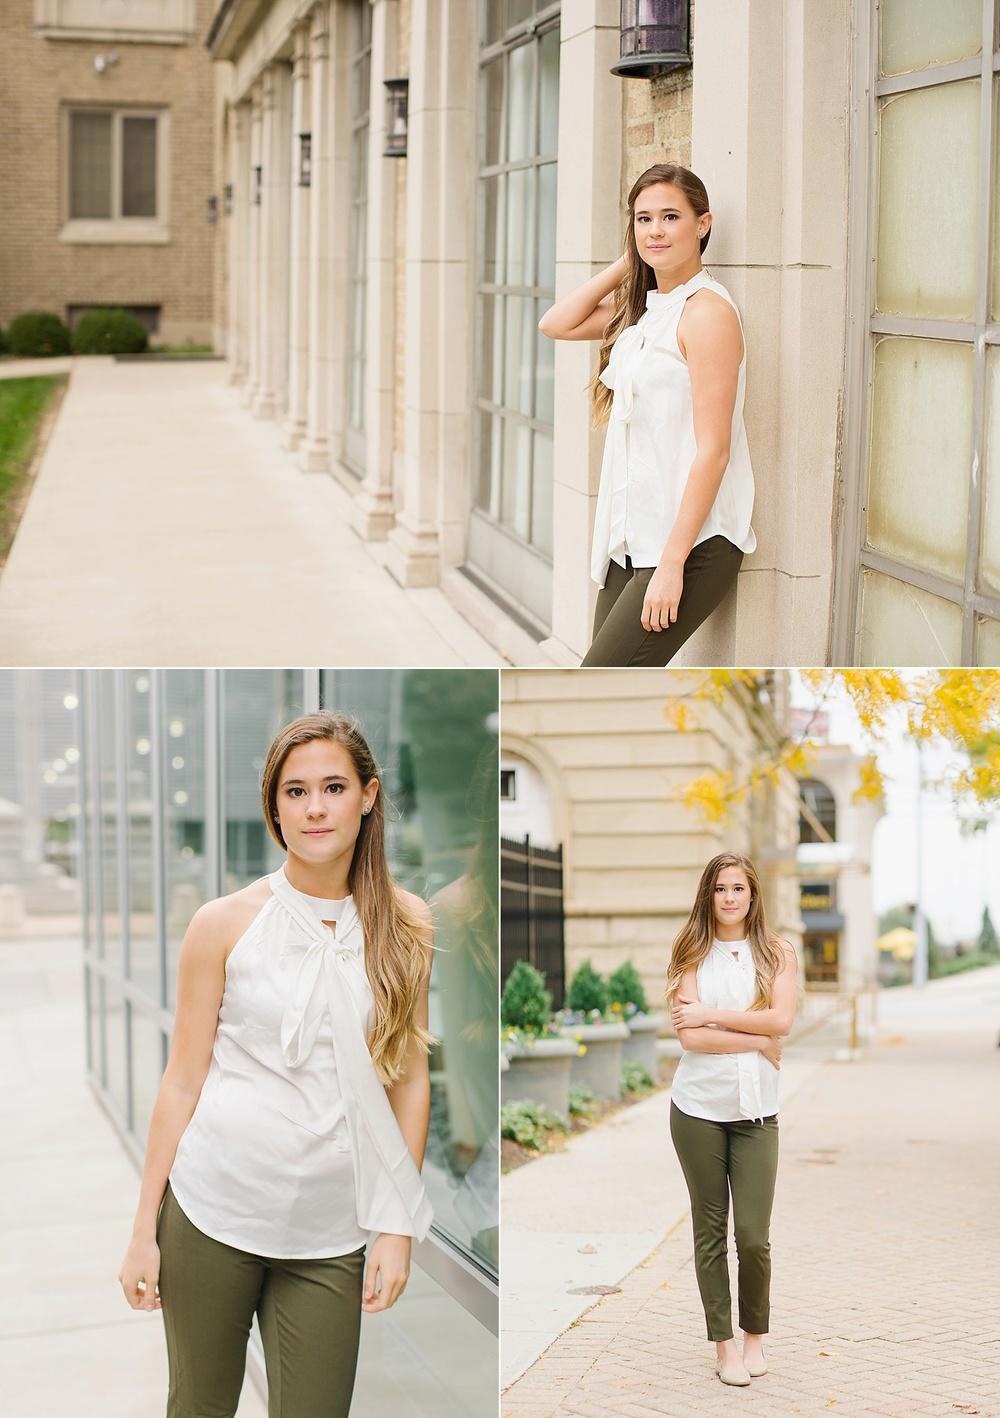 Fine Art Senior Photography | Lux Senior Photography | Dayton, Ohio